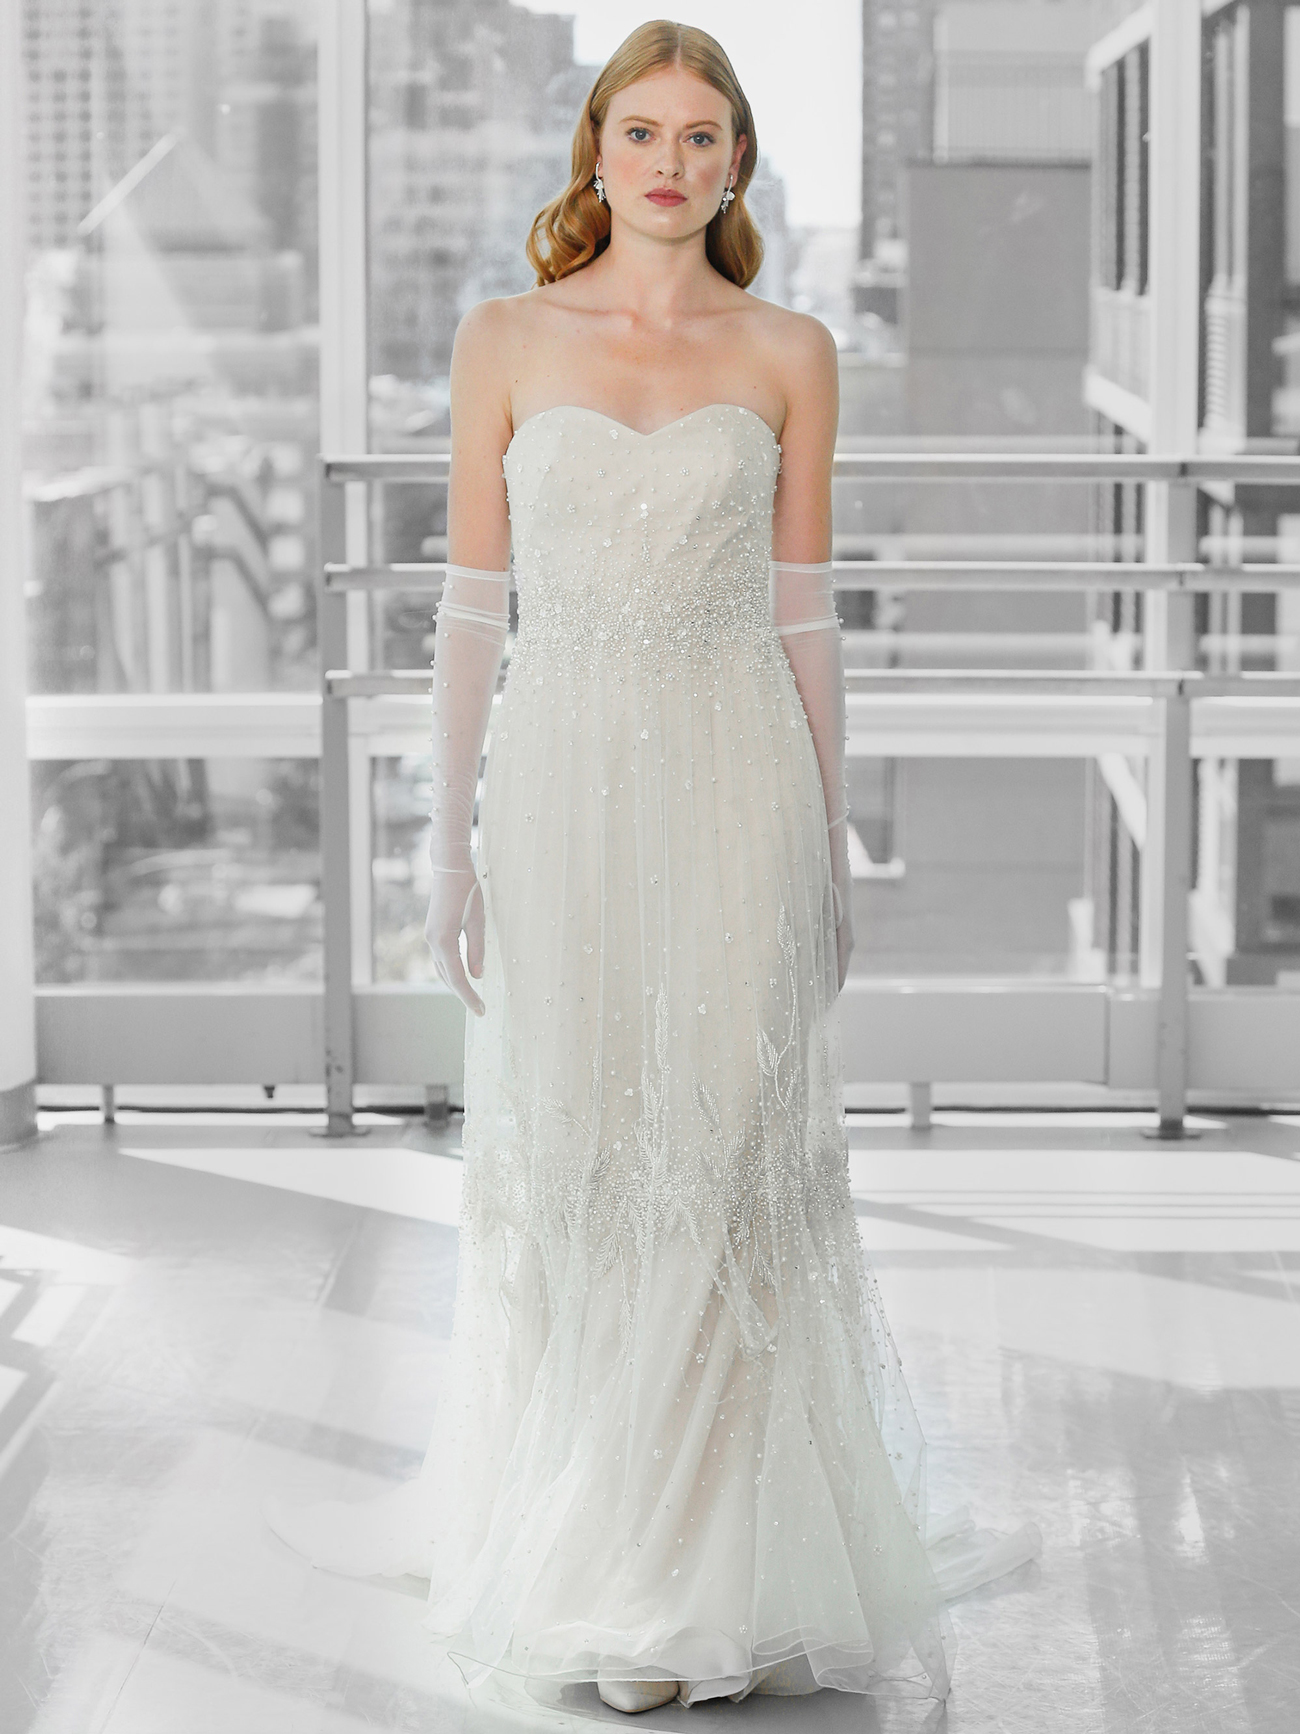 Justin Alexander Signature strapless a-line beaded wedding dress fall 2020